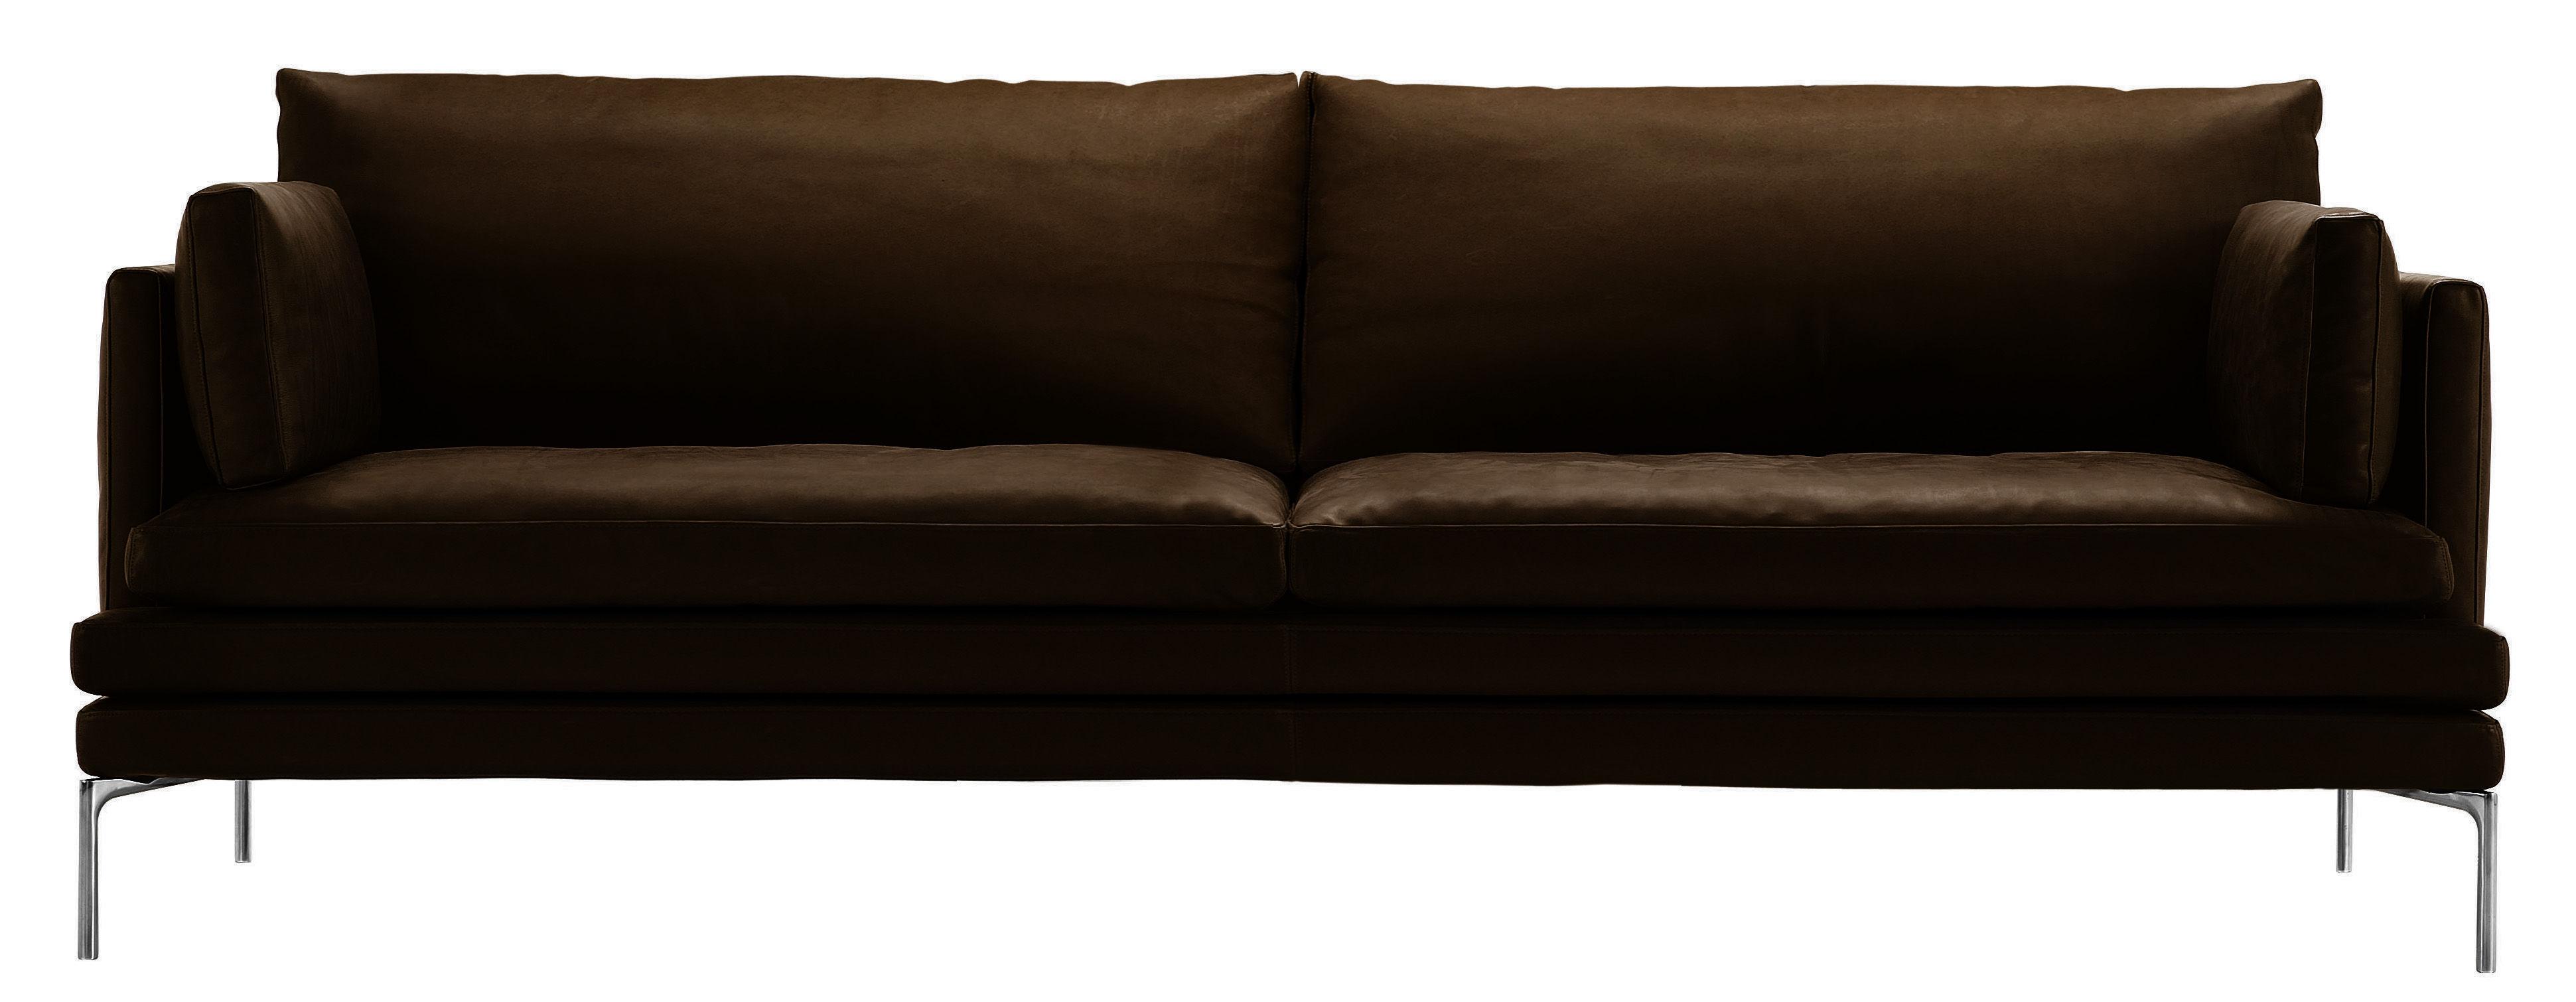 Möbel - Sofas - William Sofa / Leder - 2-Sitzer - L 224 cm - Zanotta - Leder - dunkelbraun - Leder, poliertes Aluminium